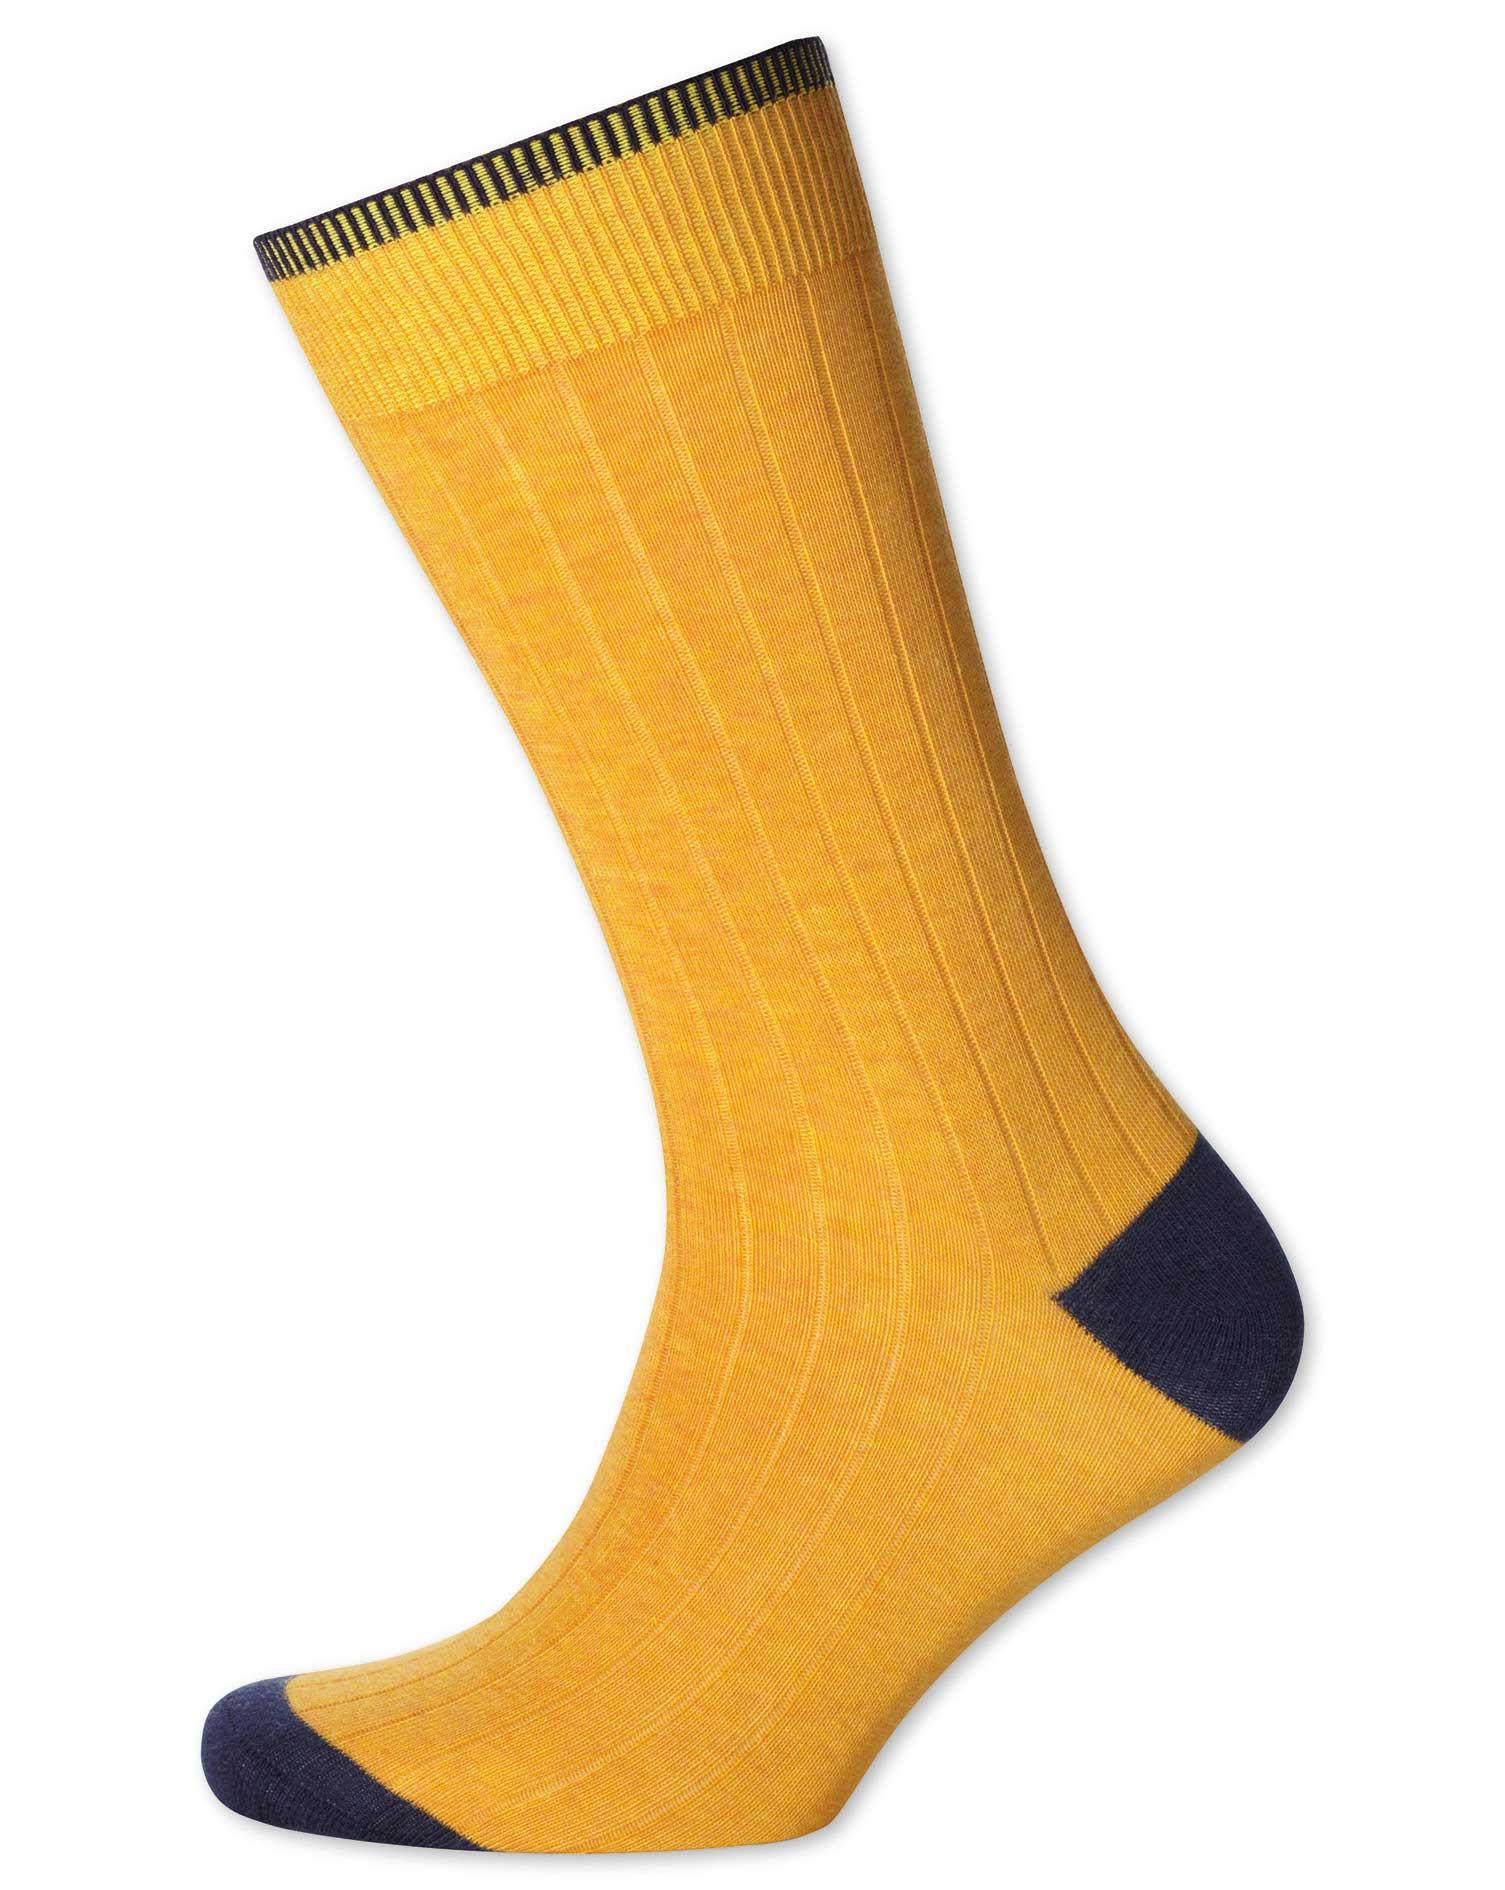 Yellow Cotton Rib Socks Size Medium by Charles Tyrwhitt